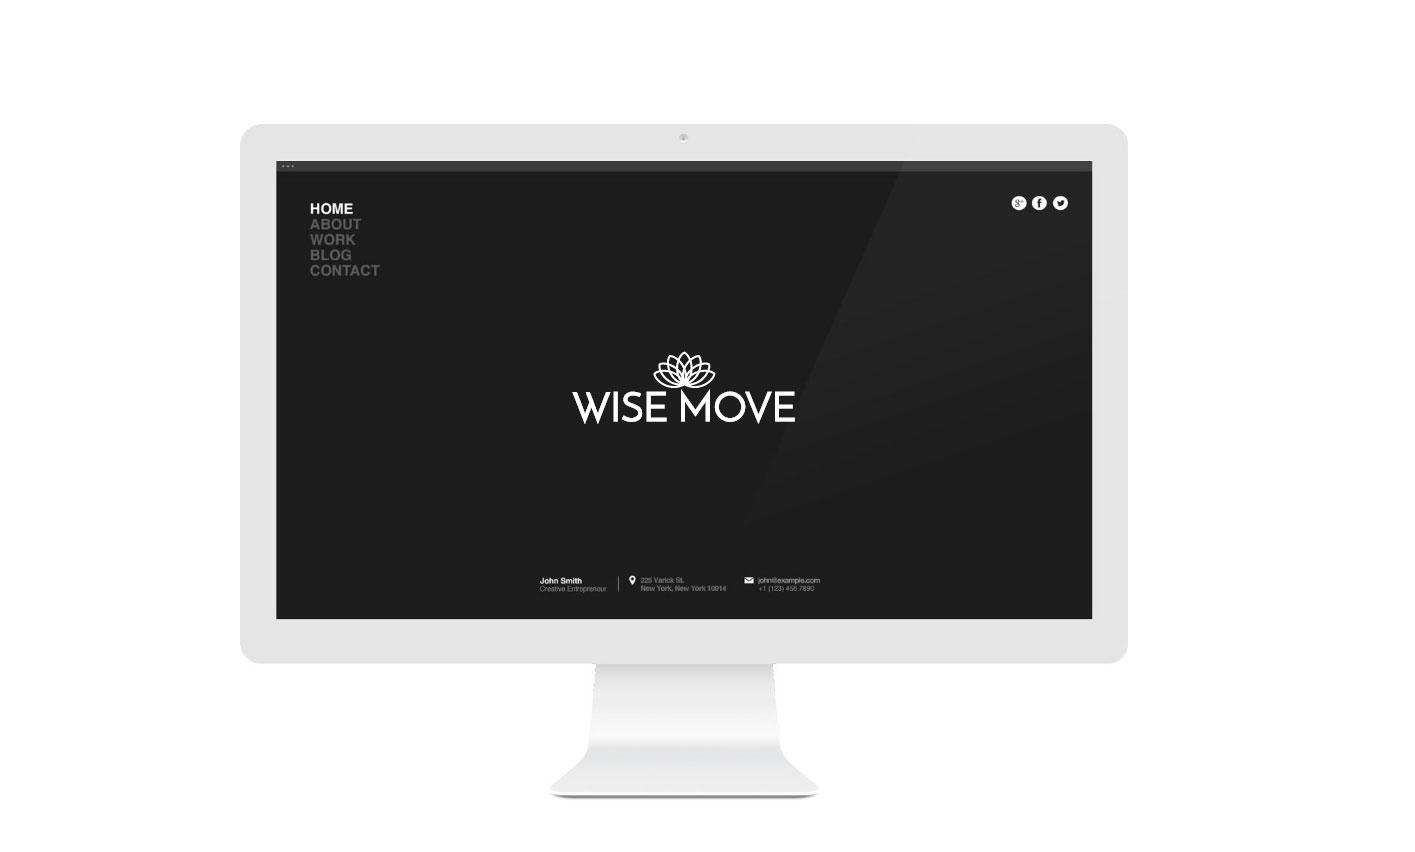 Wise_Move_Logos_08.jpg